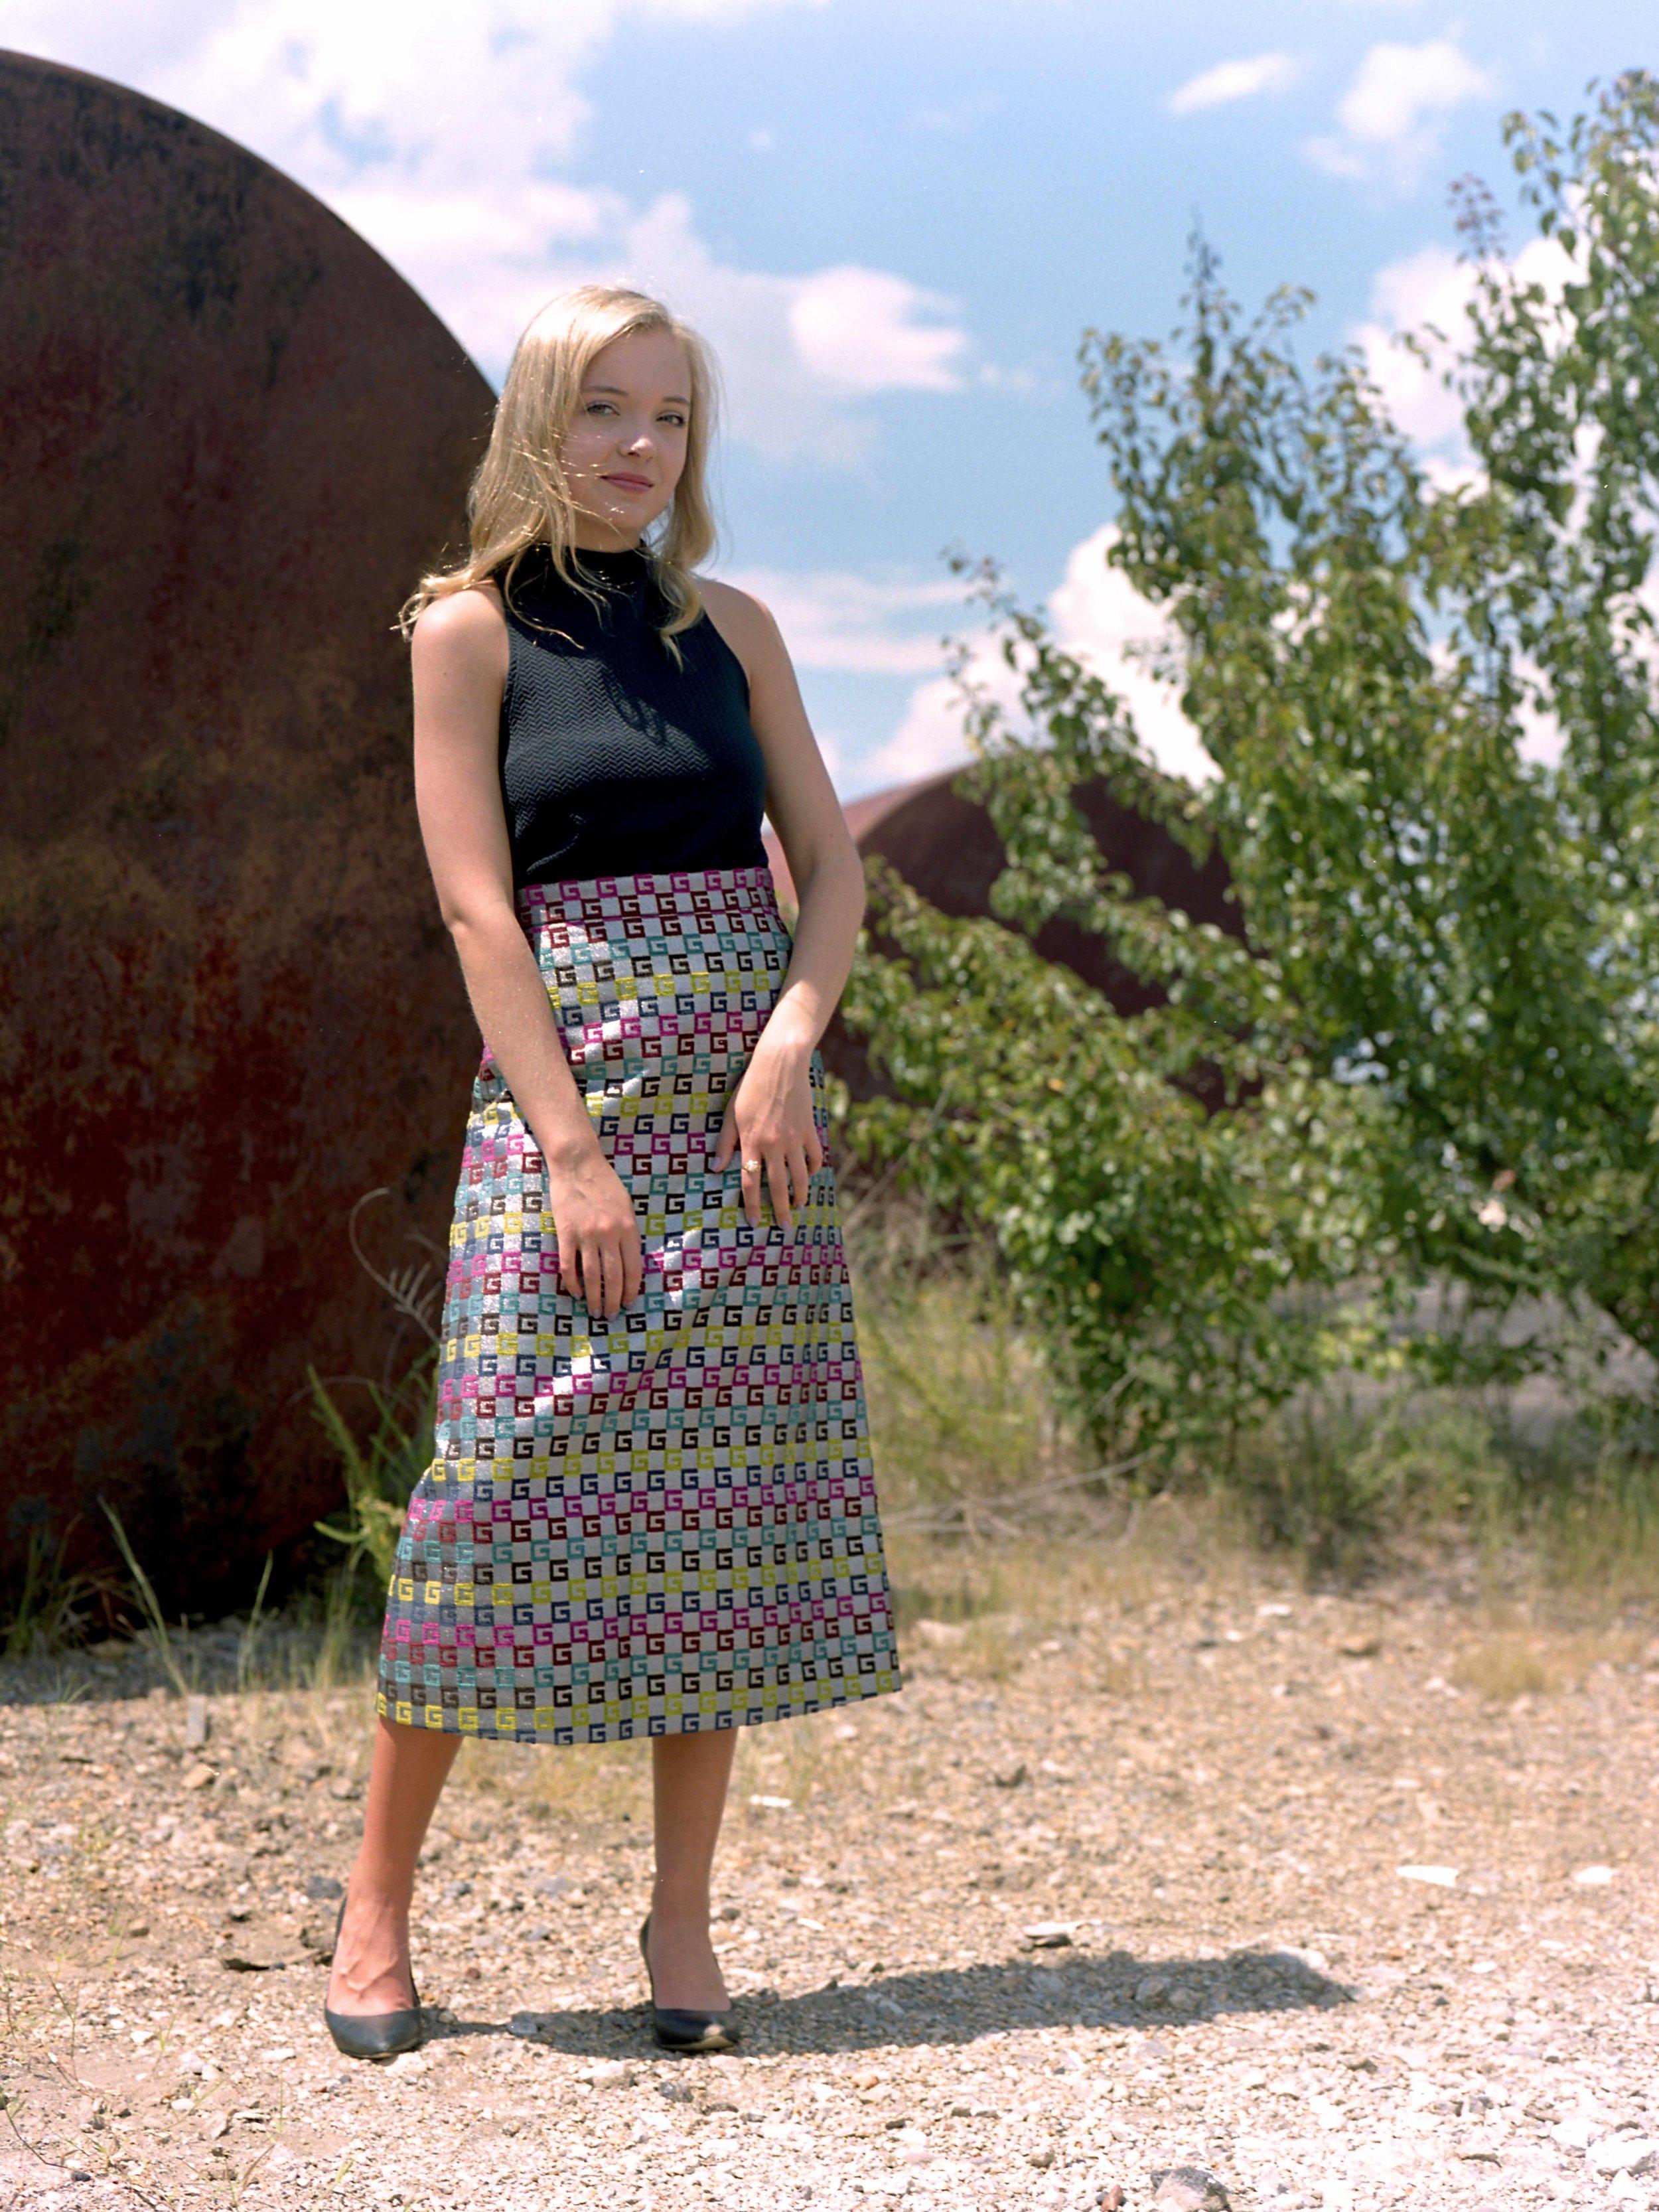 Mamiya m645 / Kodak Portra 400 / Gucci